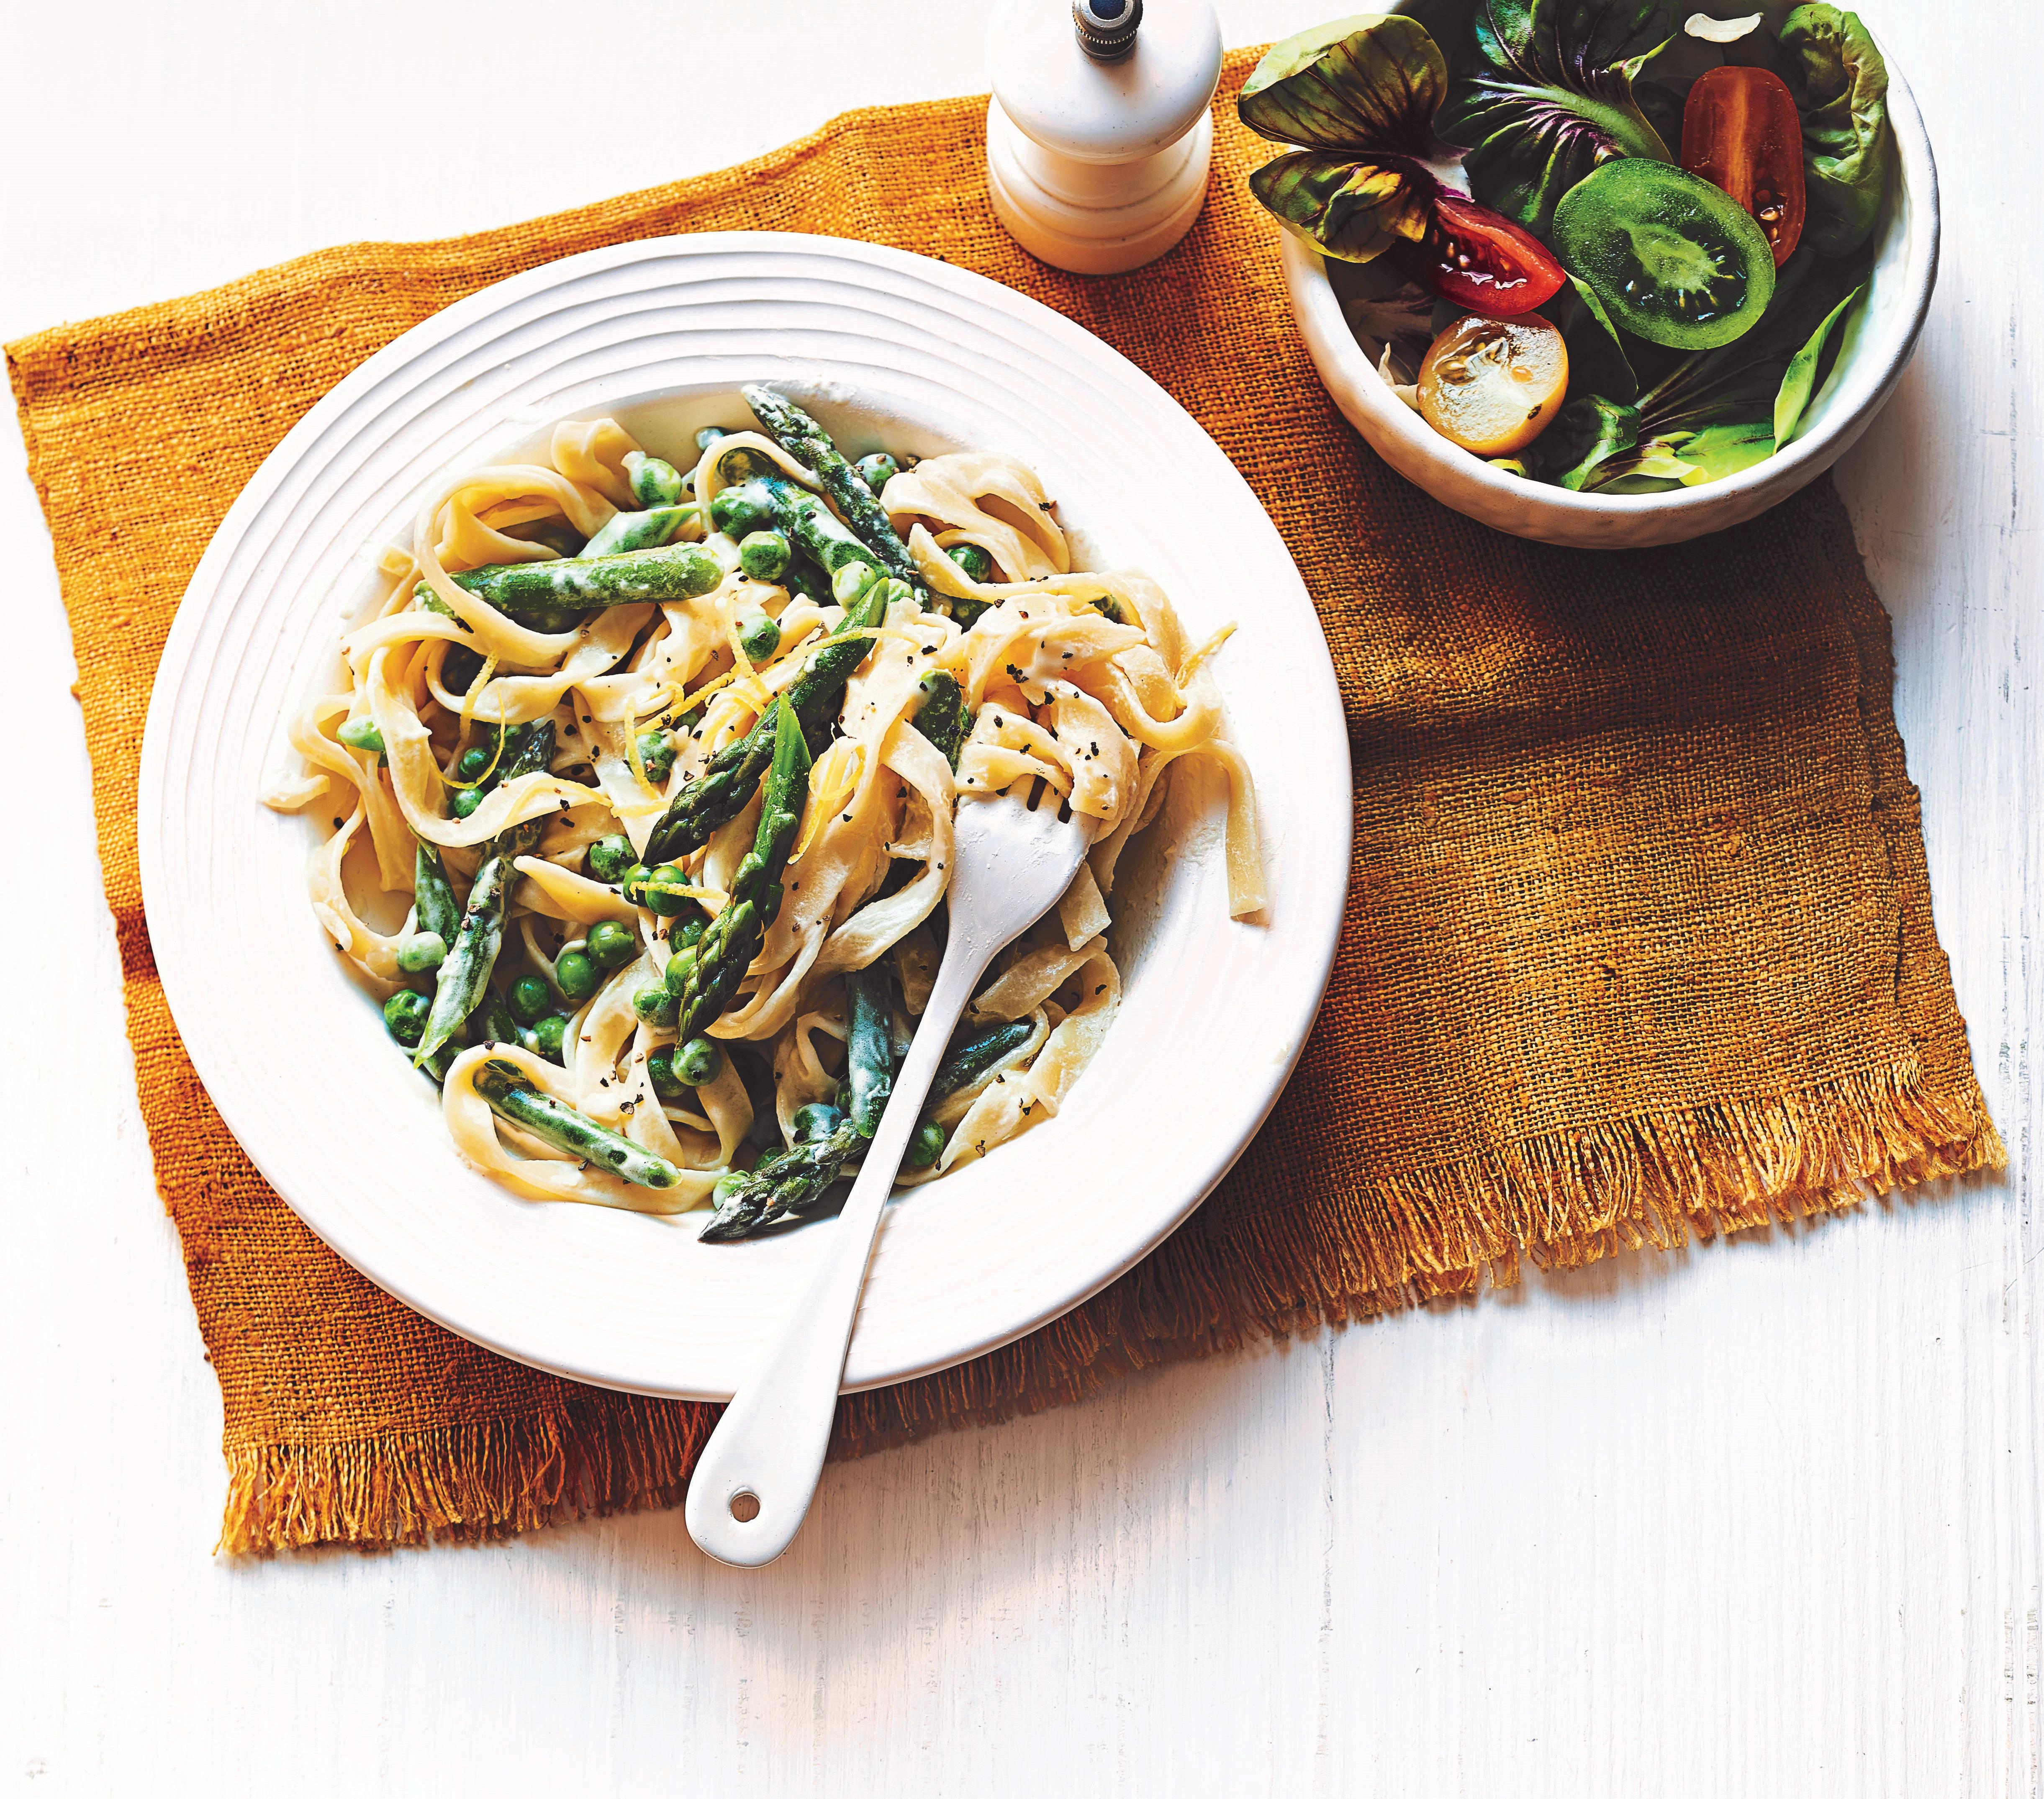 Photo of Pasta primavera with asparagus & peas by WW